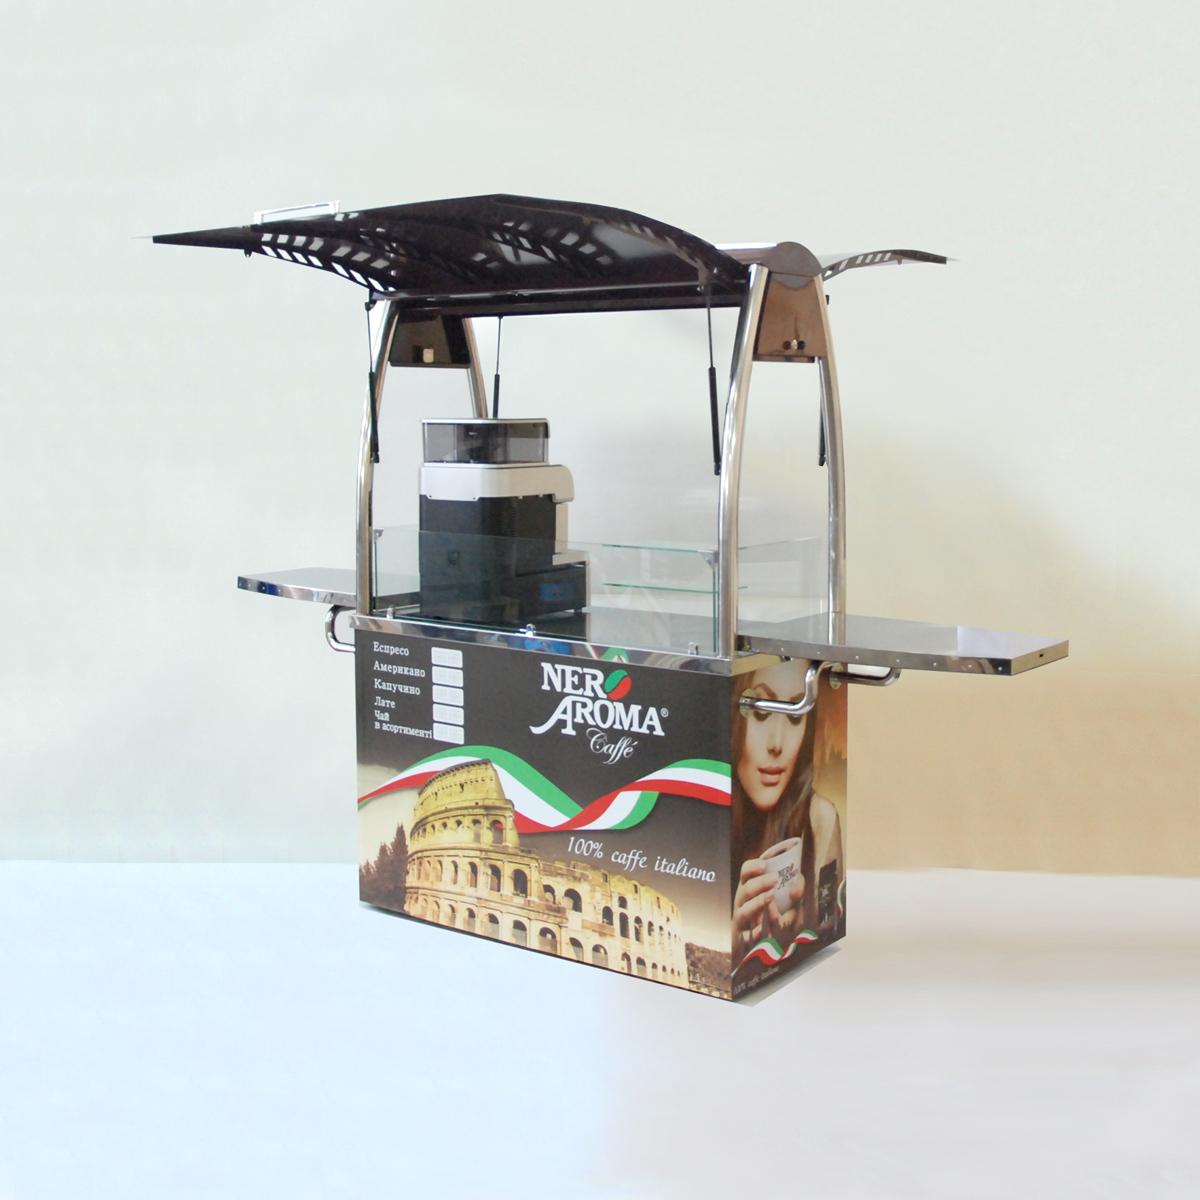 Coffe-nero-aroma